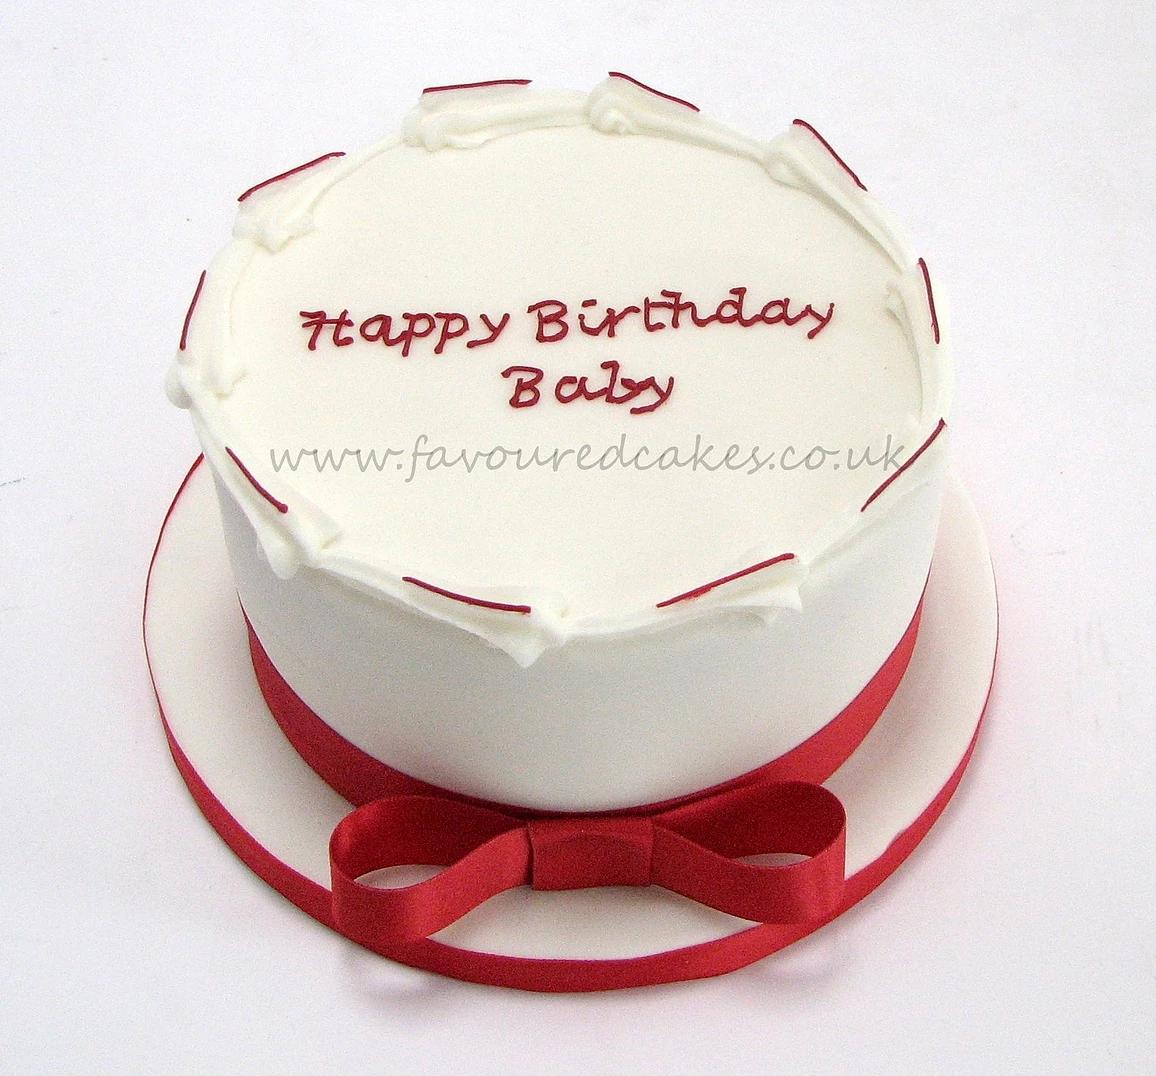 Simple Iced Birthday Cake